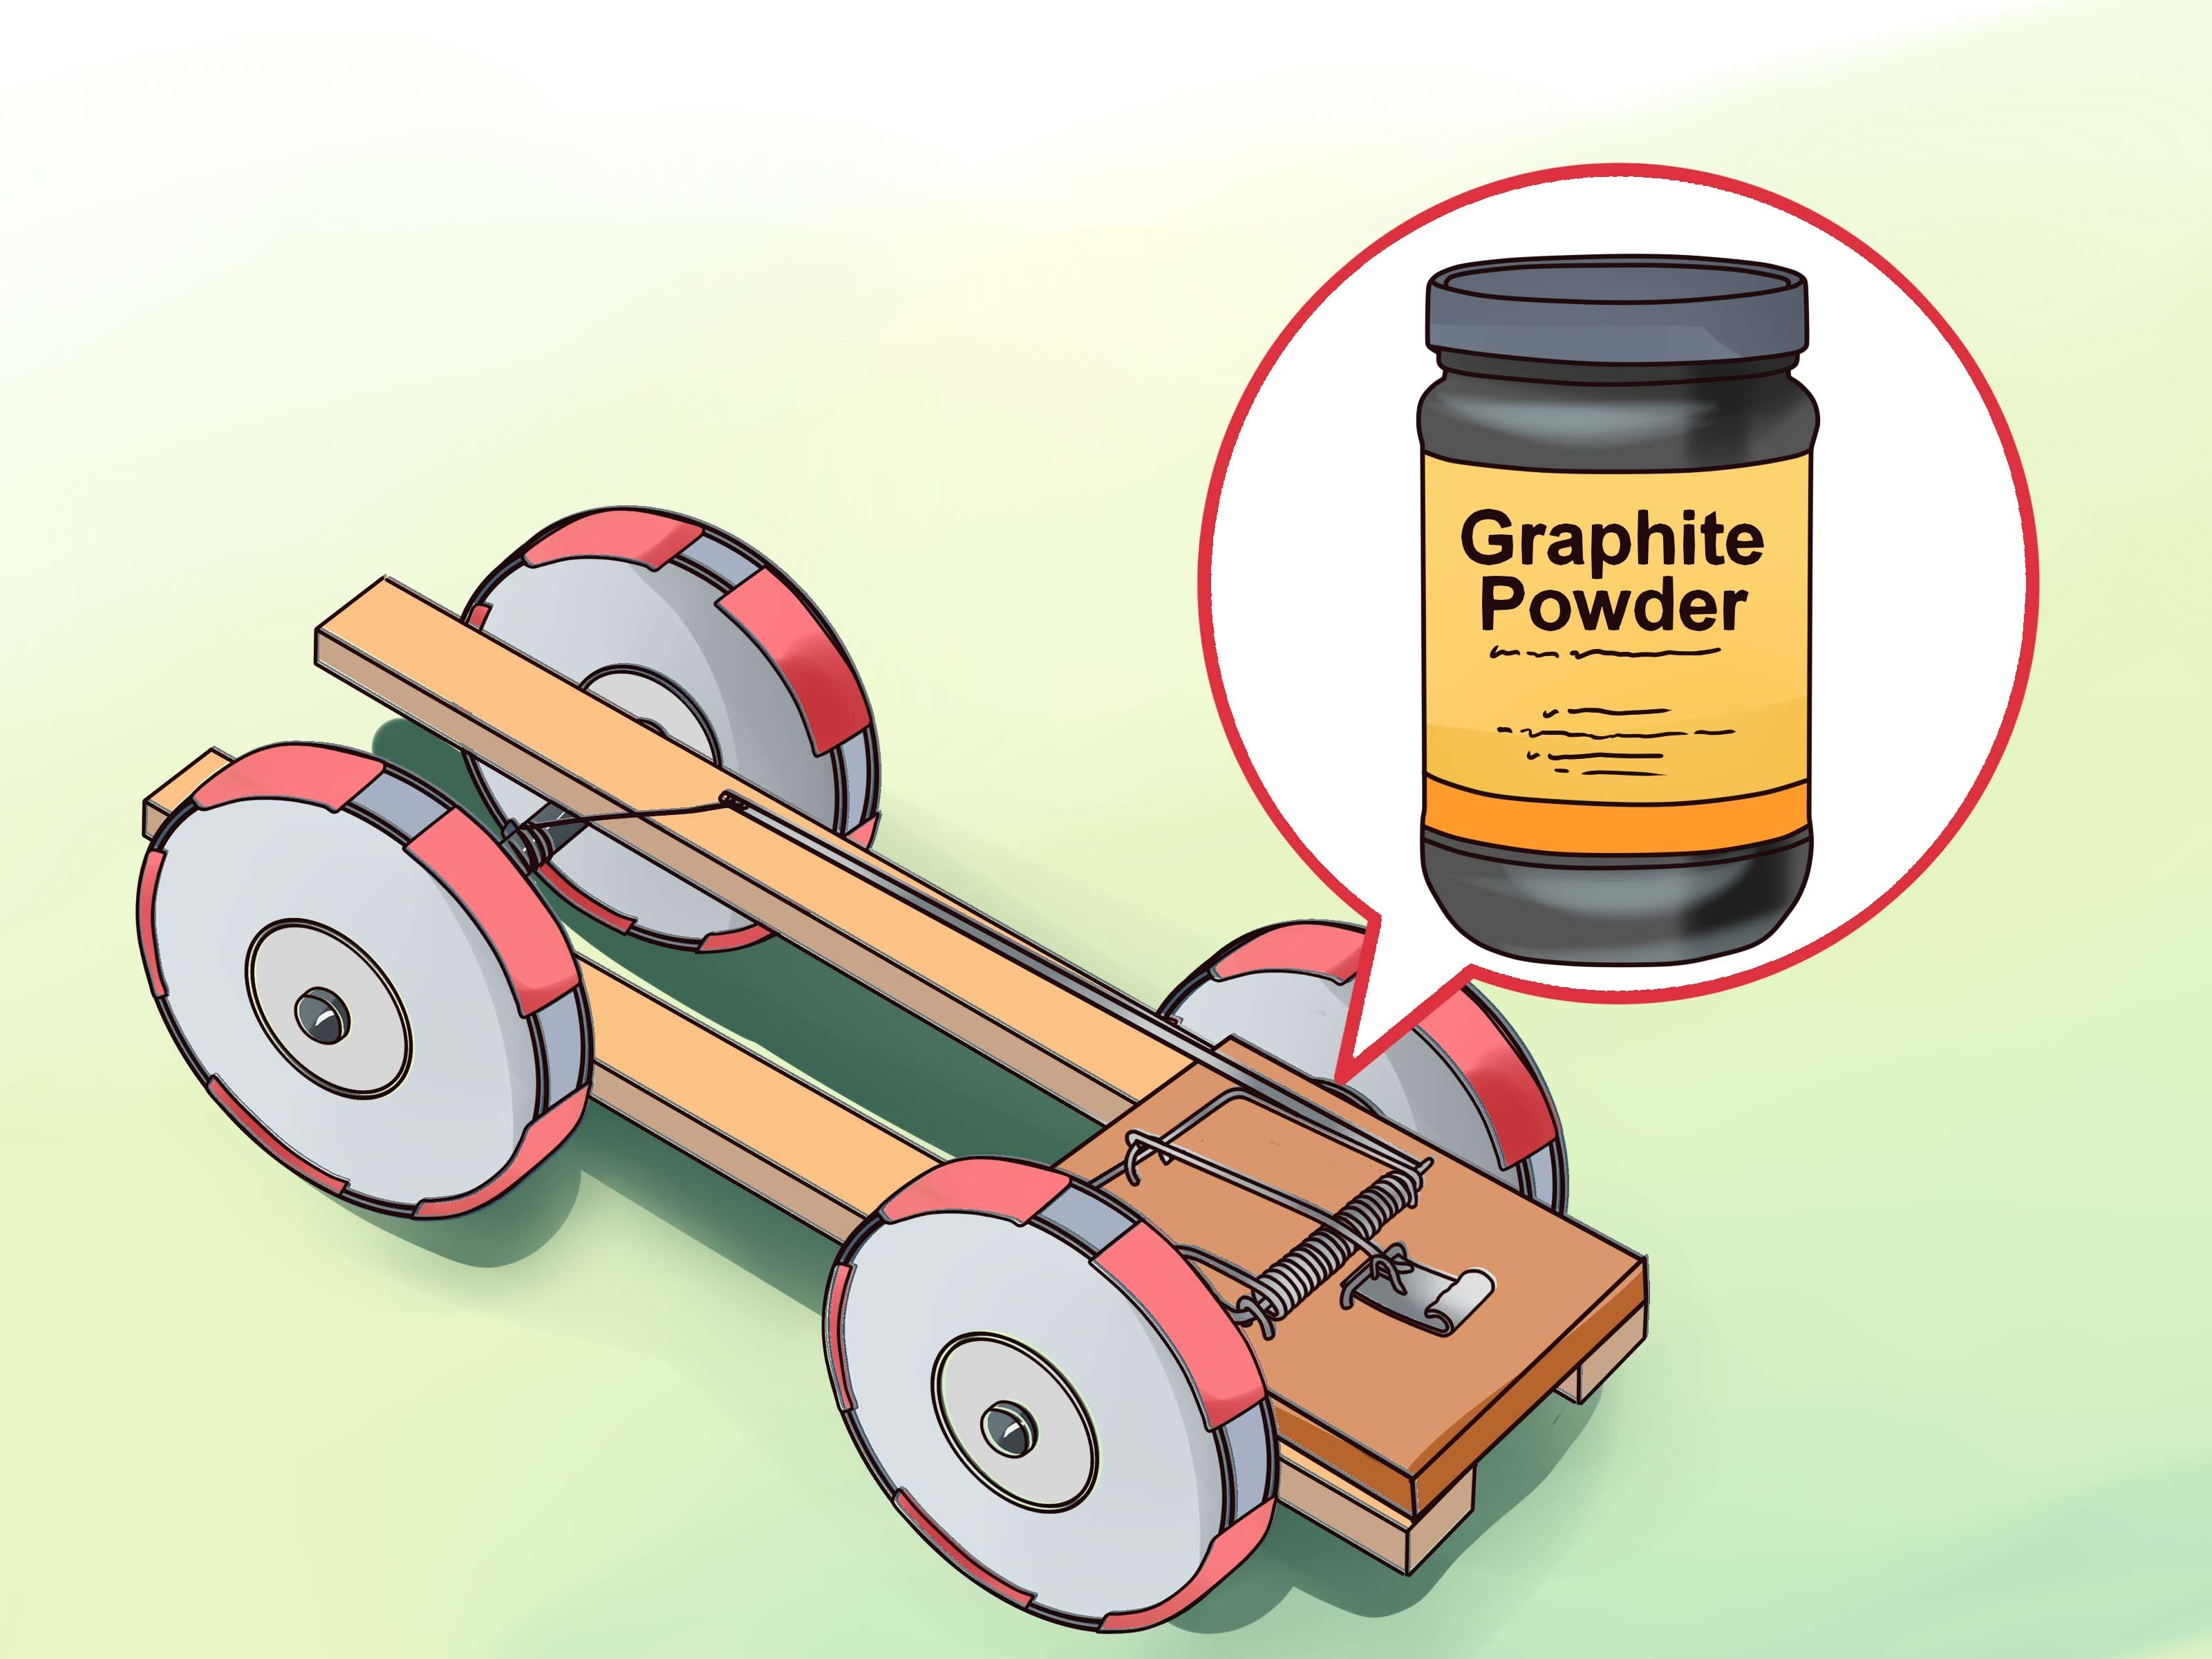 Mousetrap Car Diagram How to Adapt A Mousetrap Car for Speed 9 Steps with Of Mousetrap Car Diagram